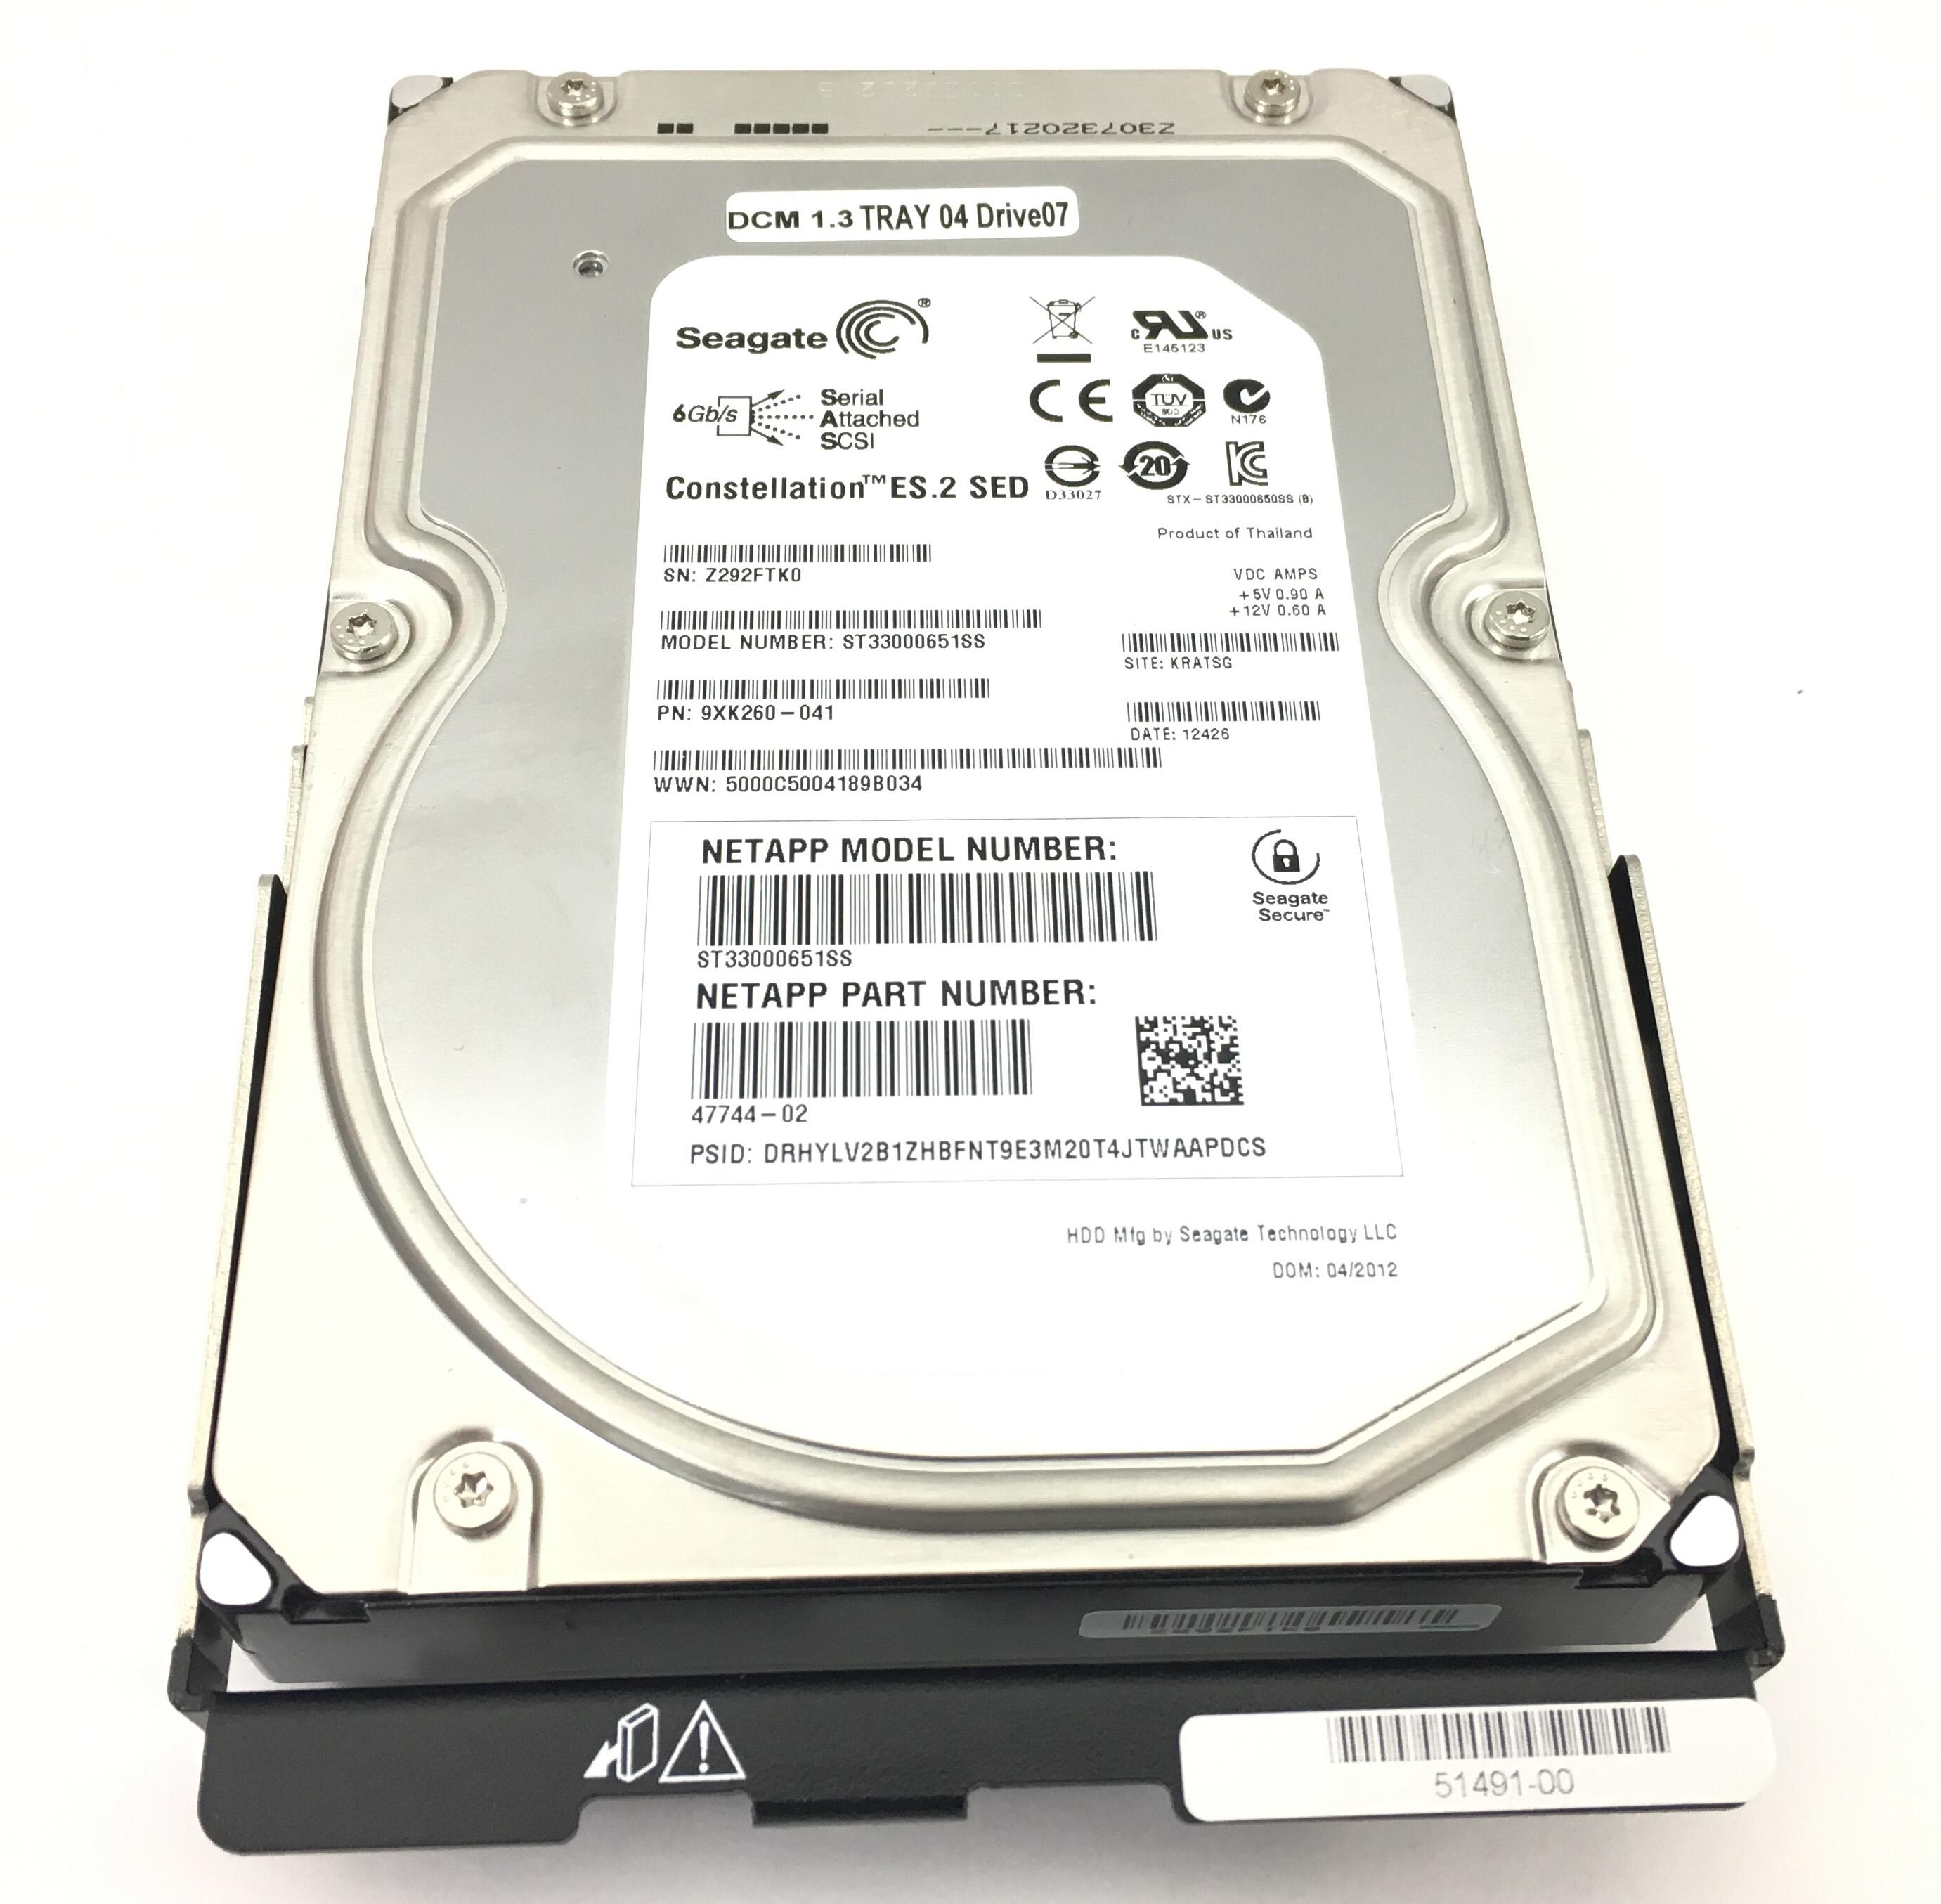 NetApp Seagate 3TB 7.2K 6Gbps SAS 3.5'' SED Hard Drive (47744-02)